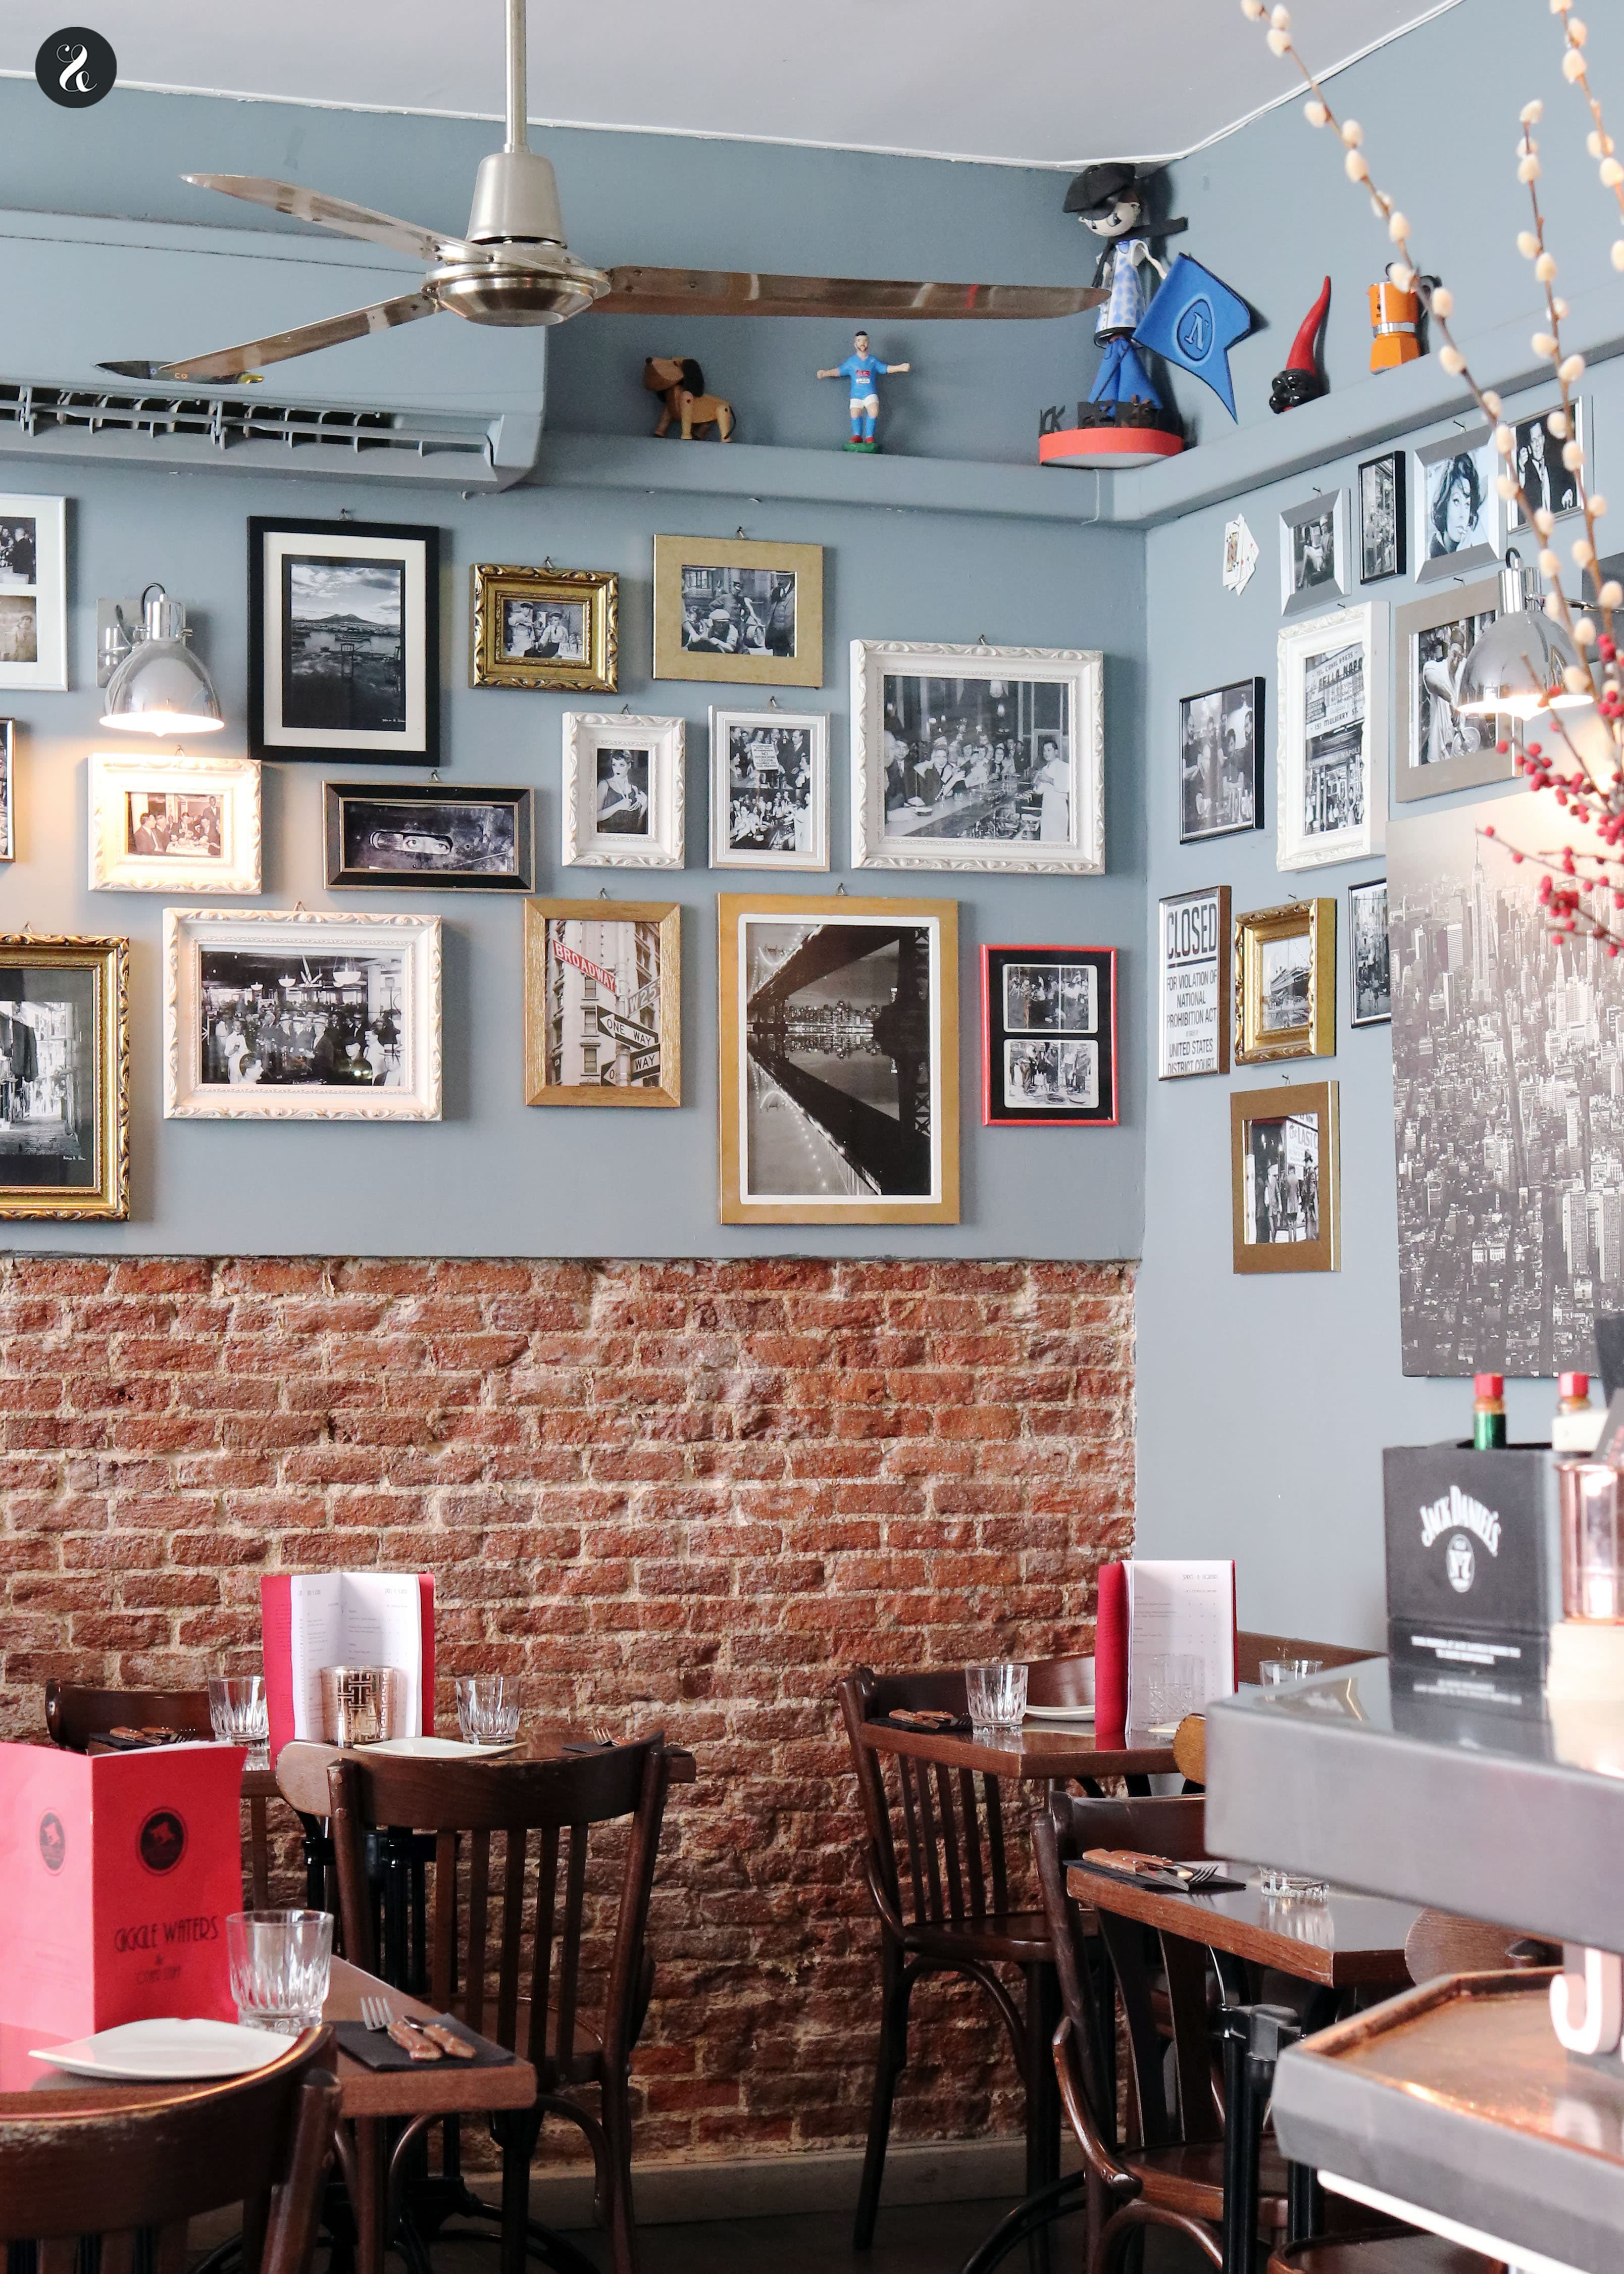 Jack Percoca - Restaurante